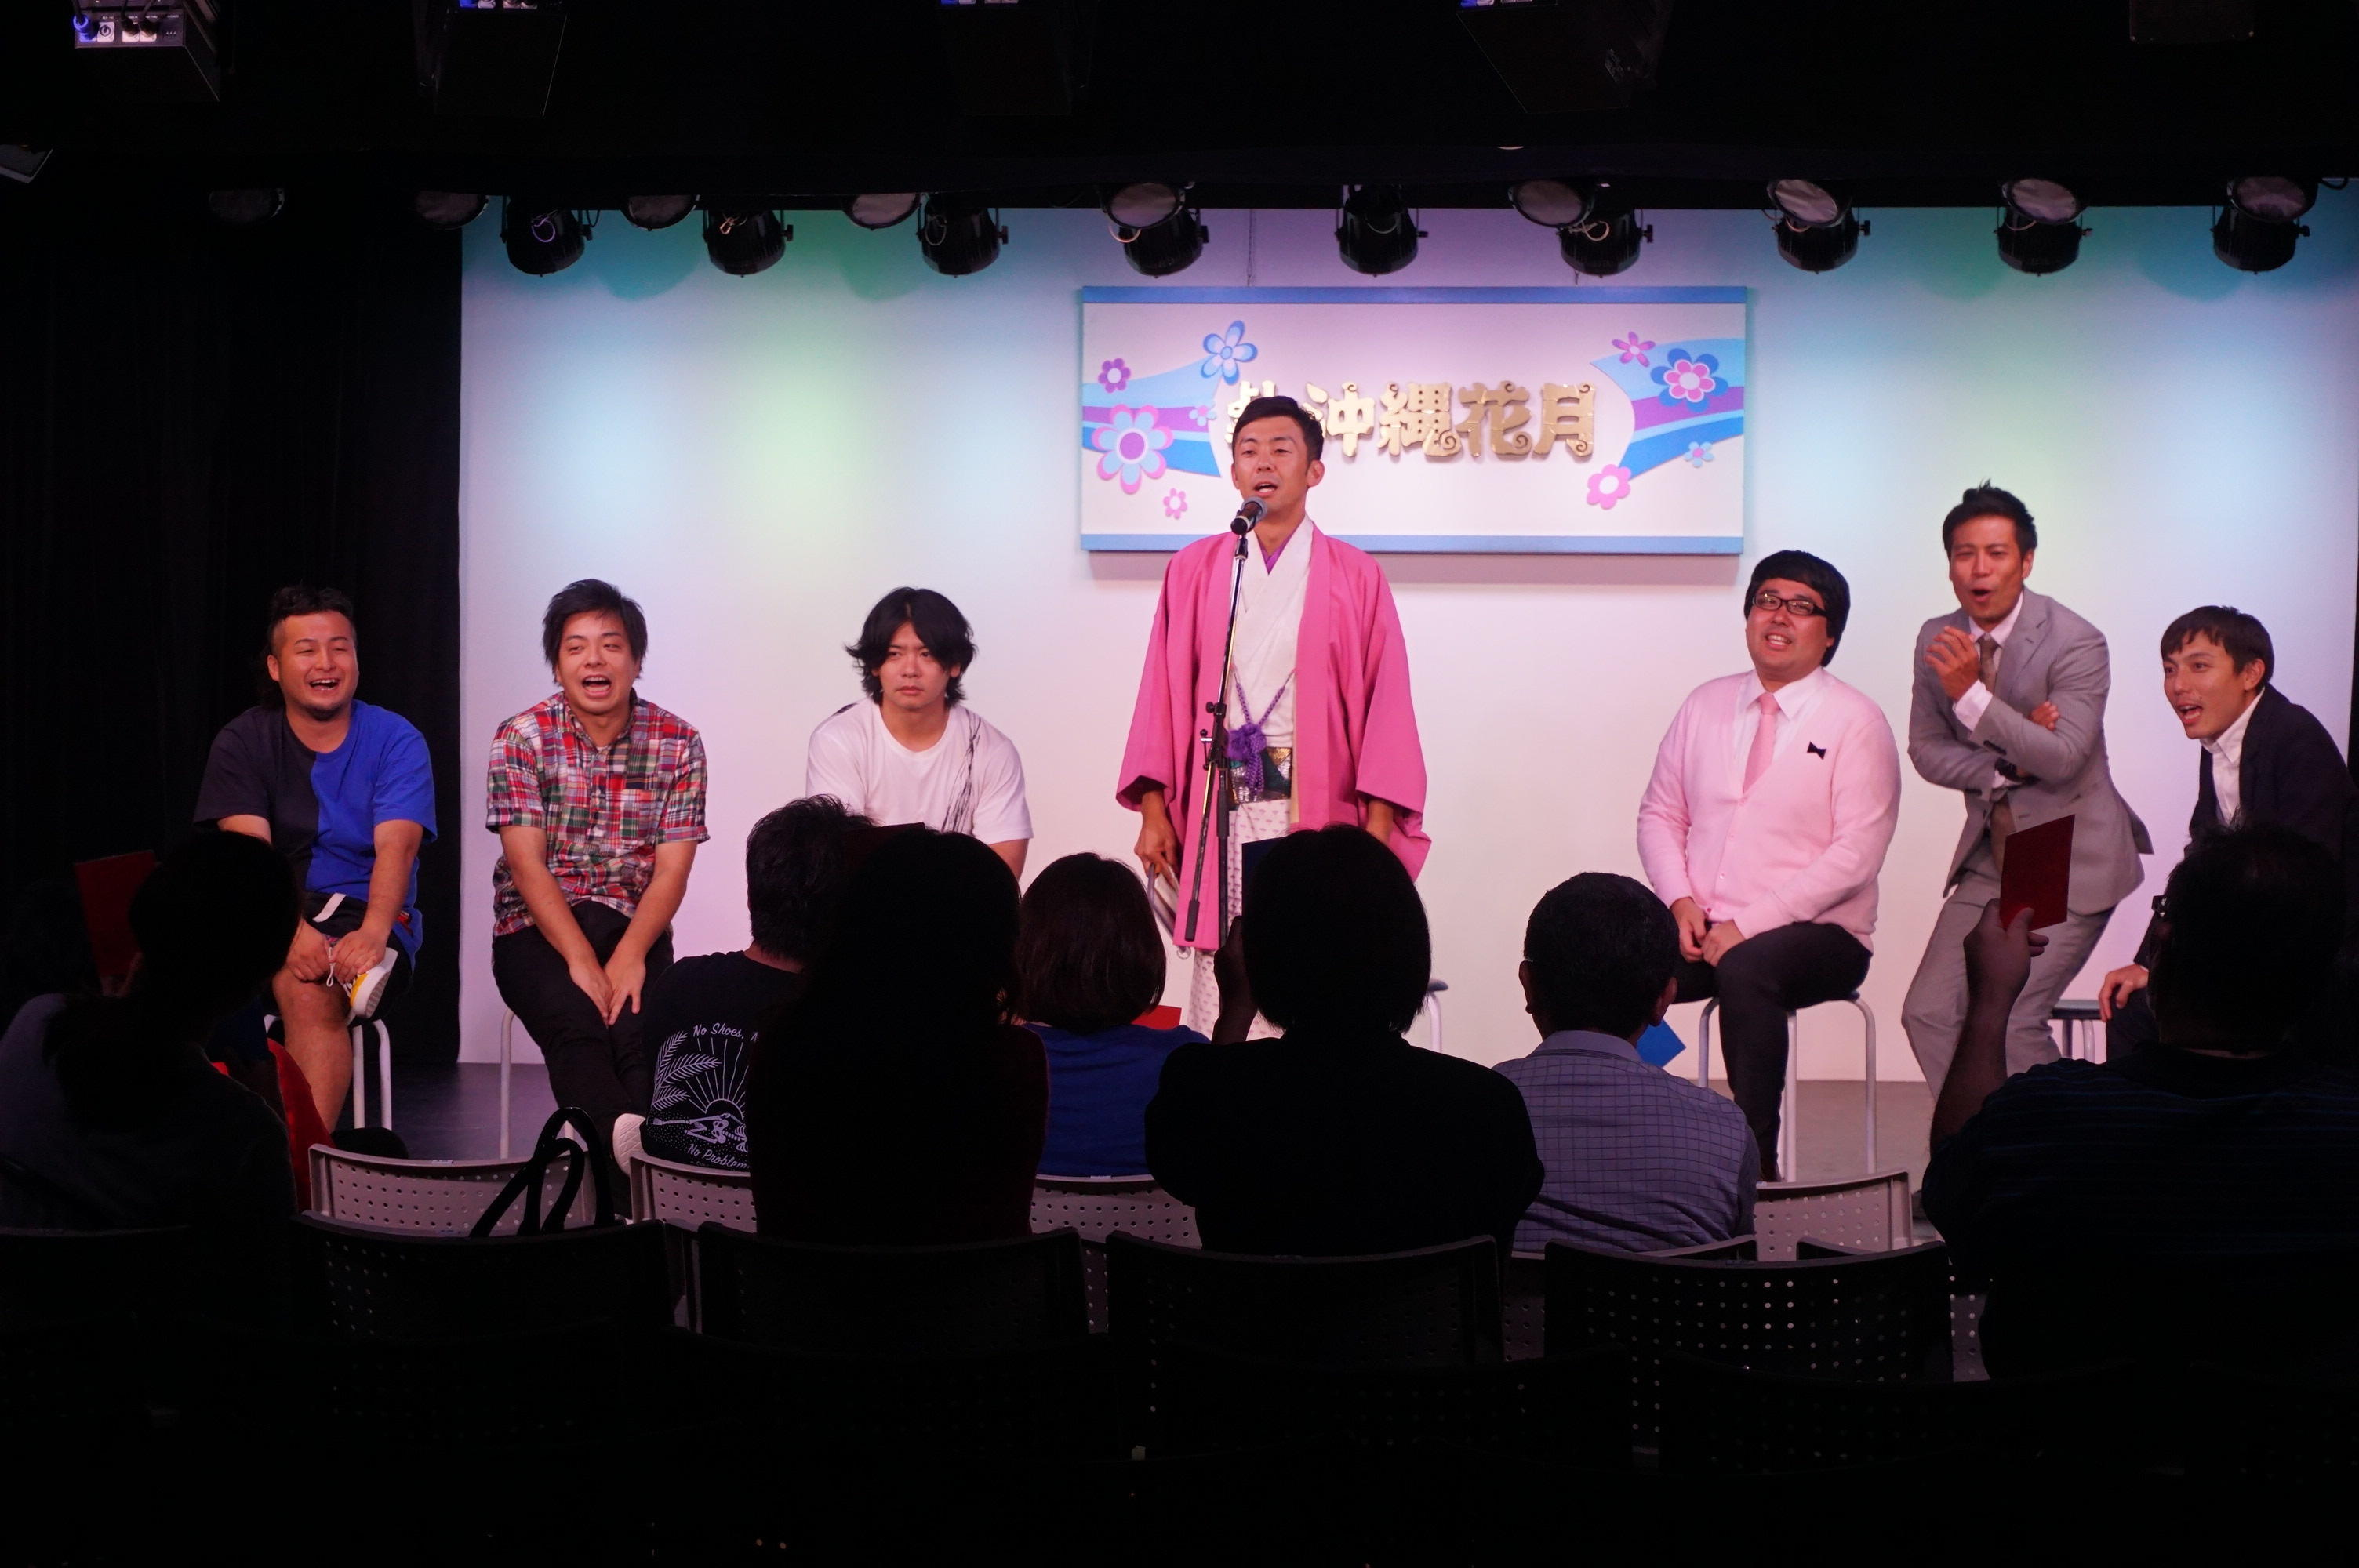 http://news.yoshimoto.co.jp/20180822203916-56ff3cf25e08a6d9dfaa1bc436fd8da57717cdef.jpg